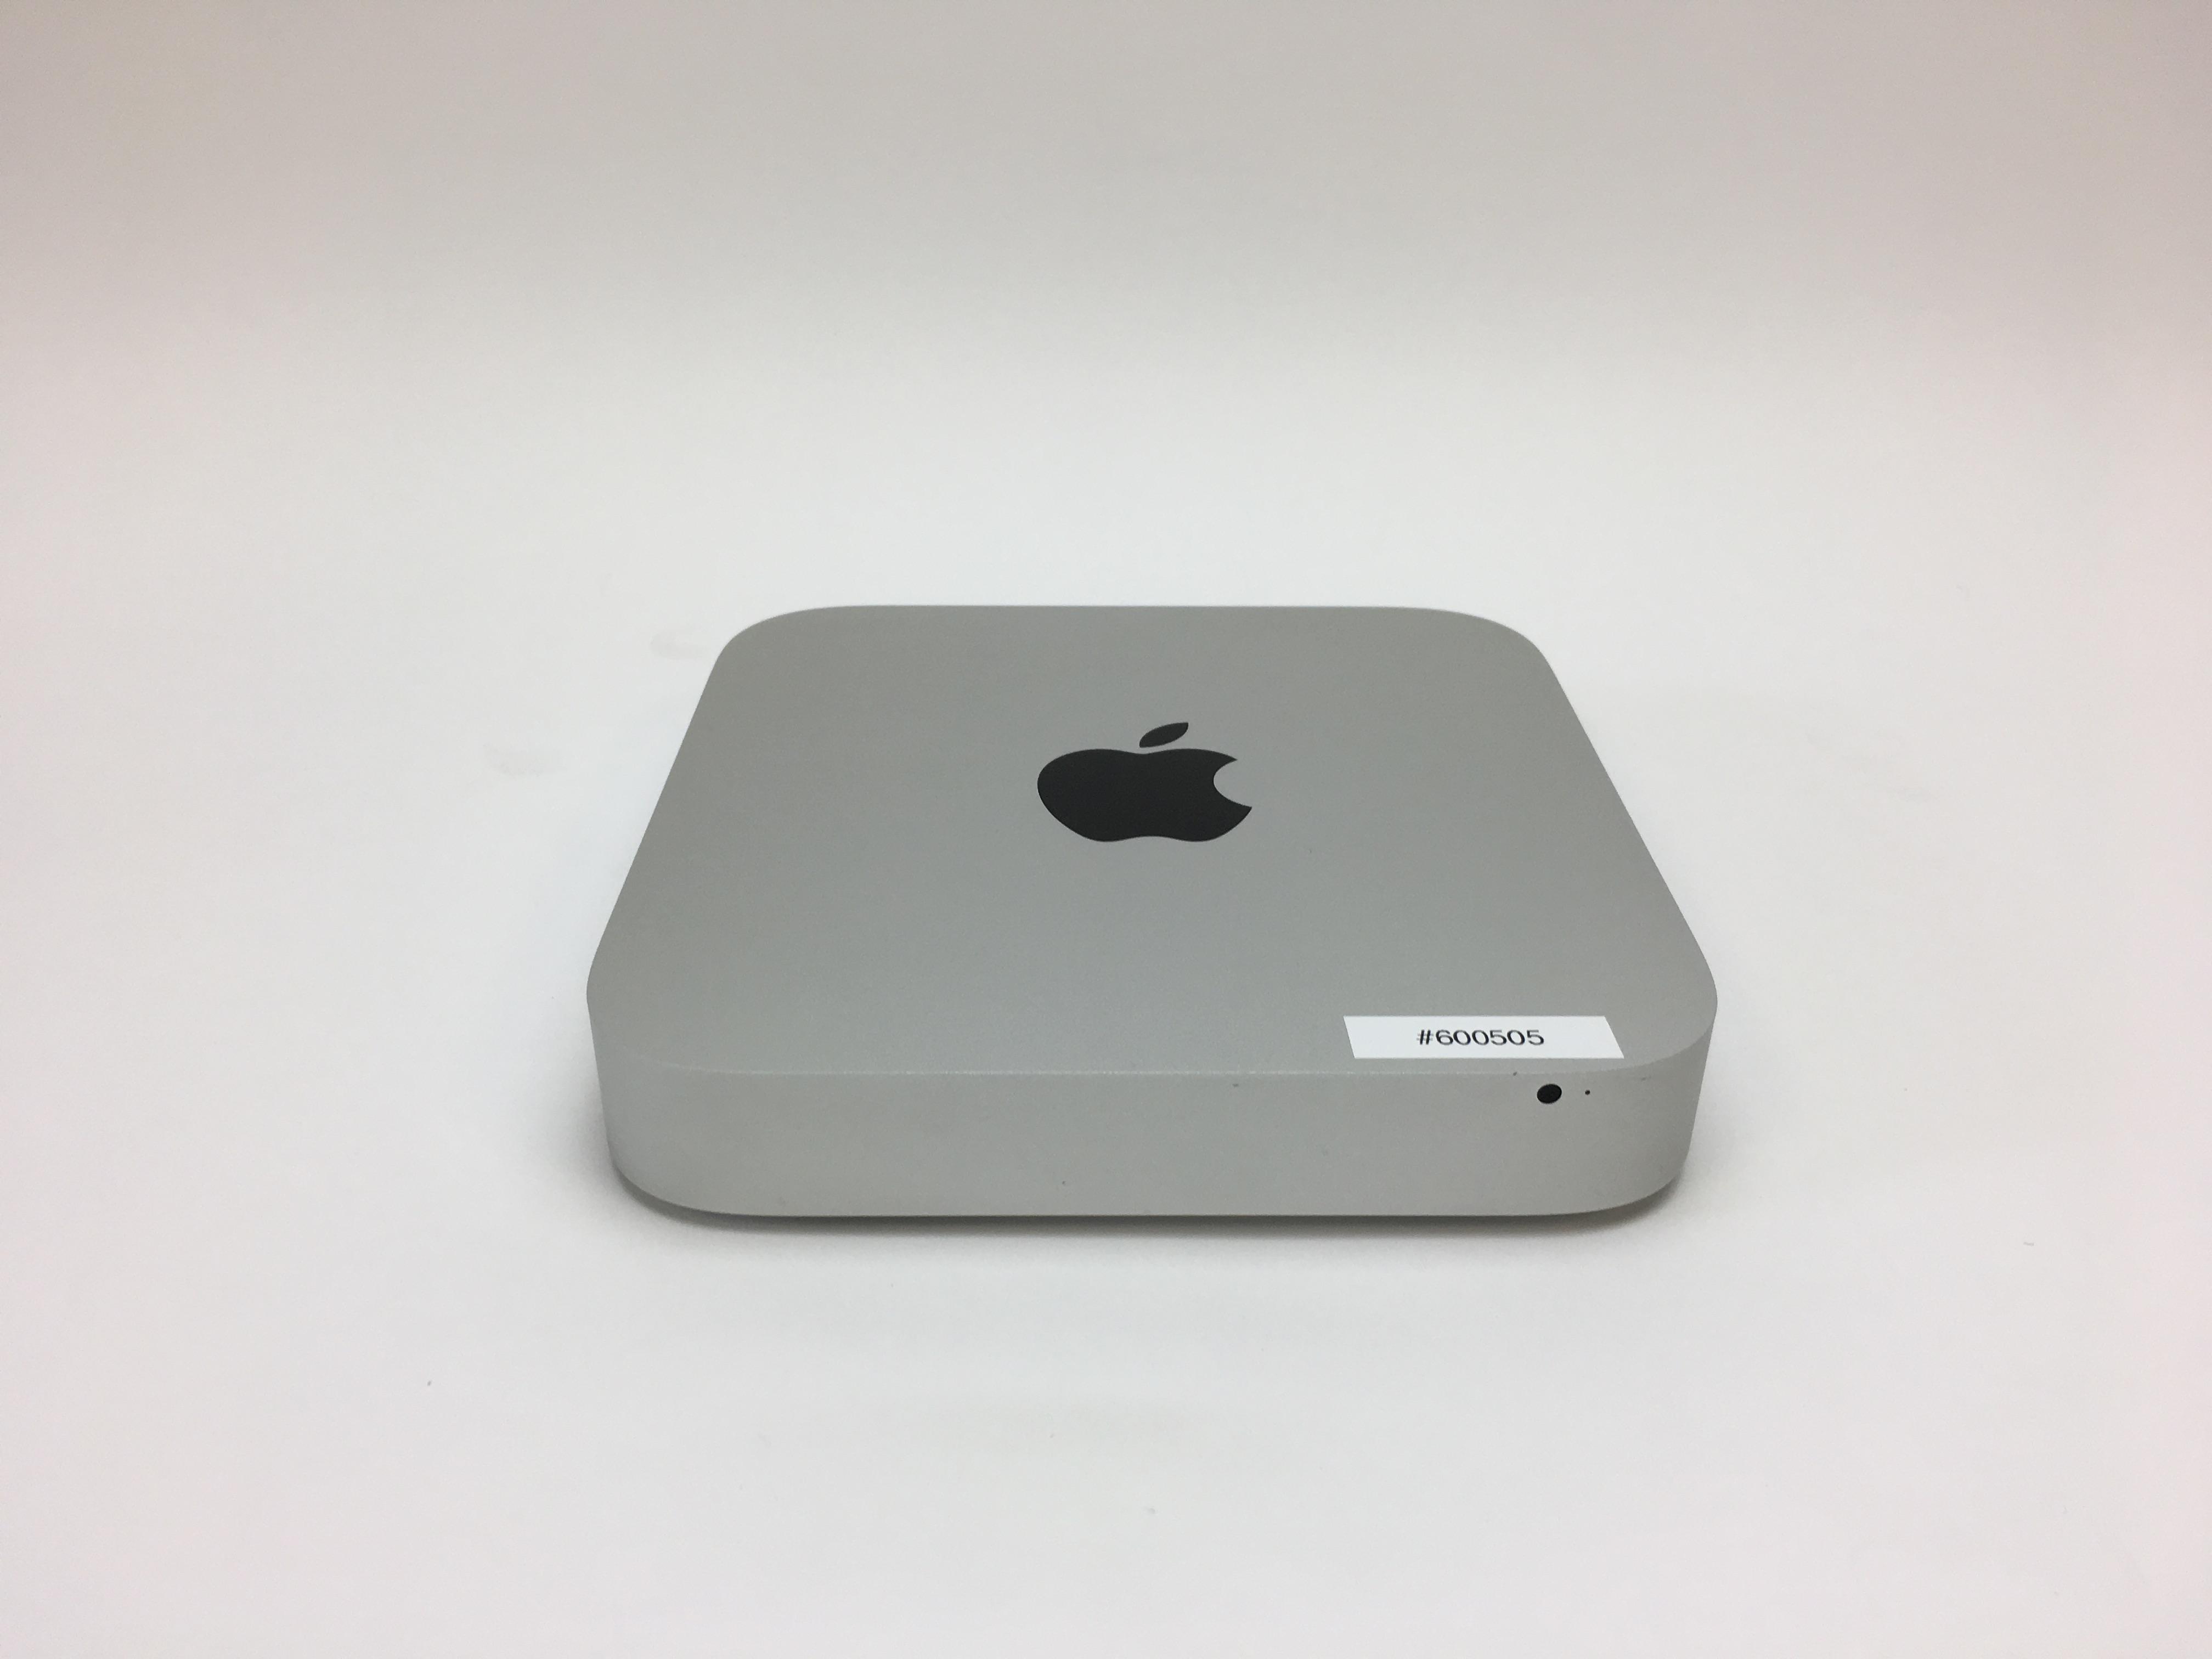 Mac mini, 1.4 GHz Intel Core i5, 4 GB 1600 MHz DDR3, 500 GB SATA Disk, Product age: 38 months, image 1